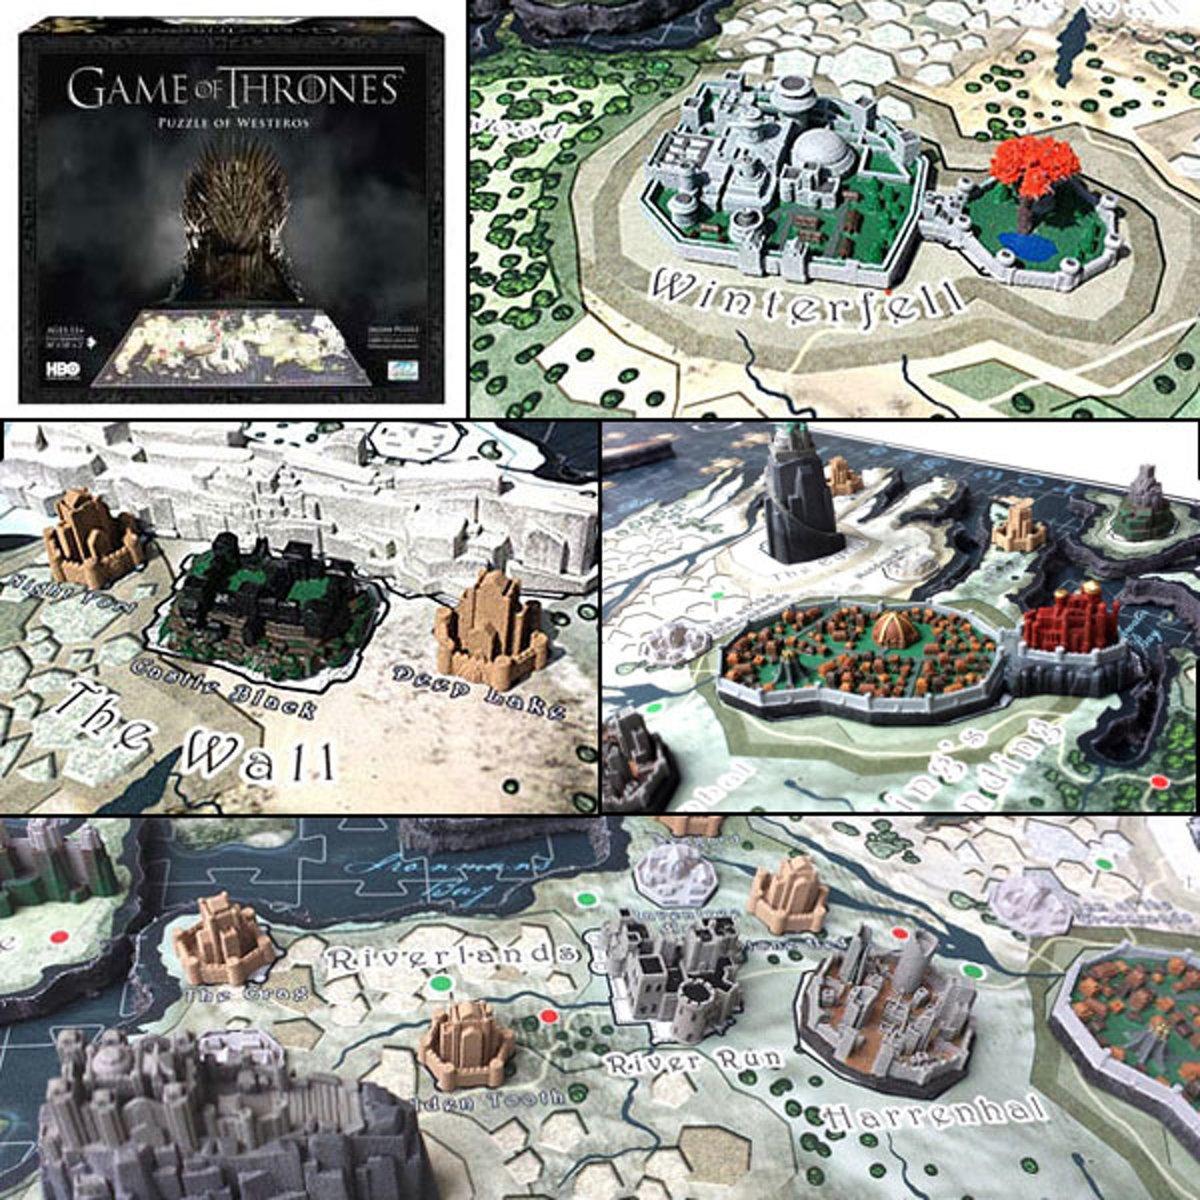 Game of Thrones 4D puzzle - Westeros